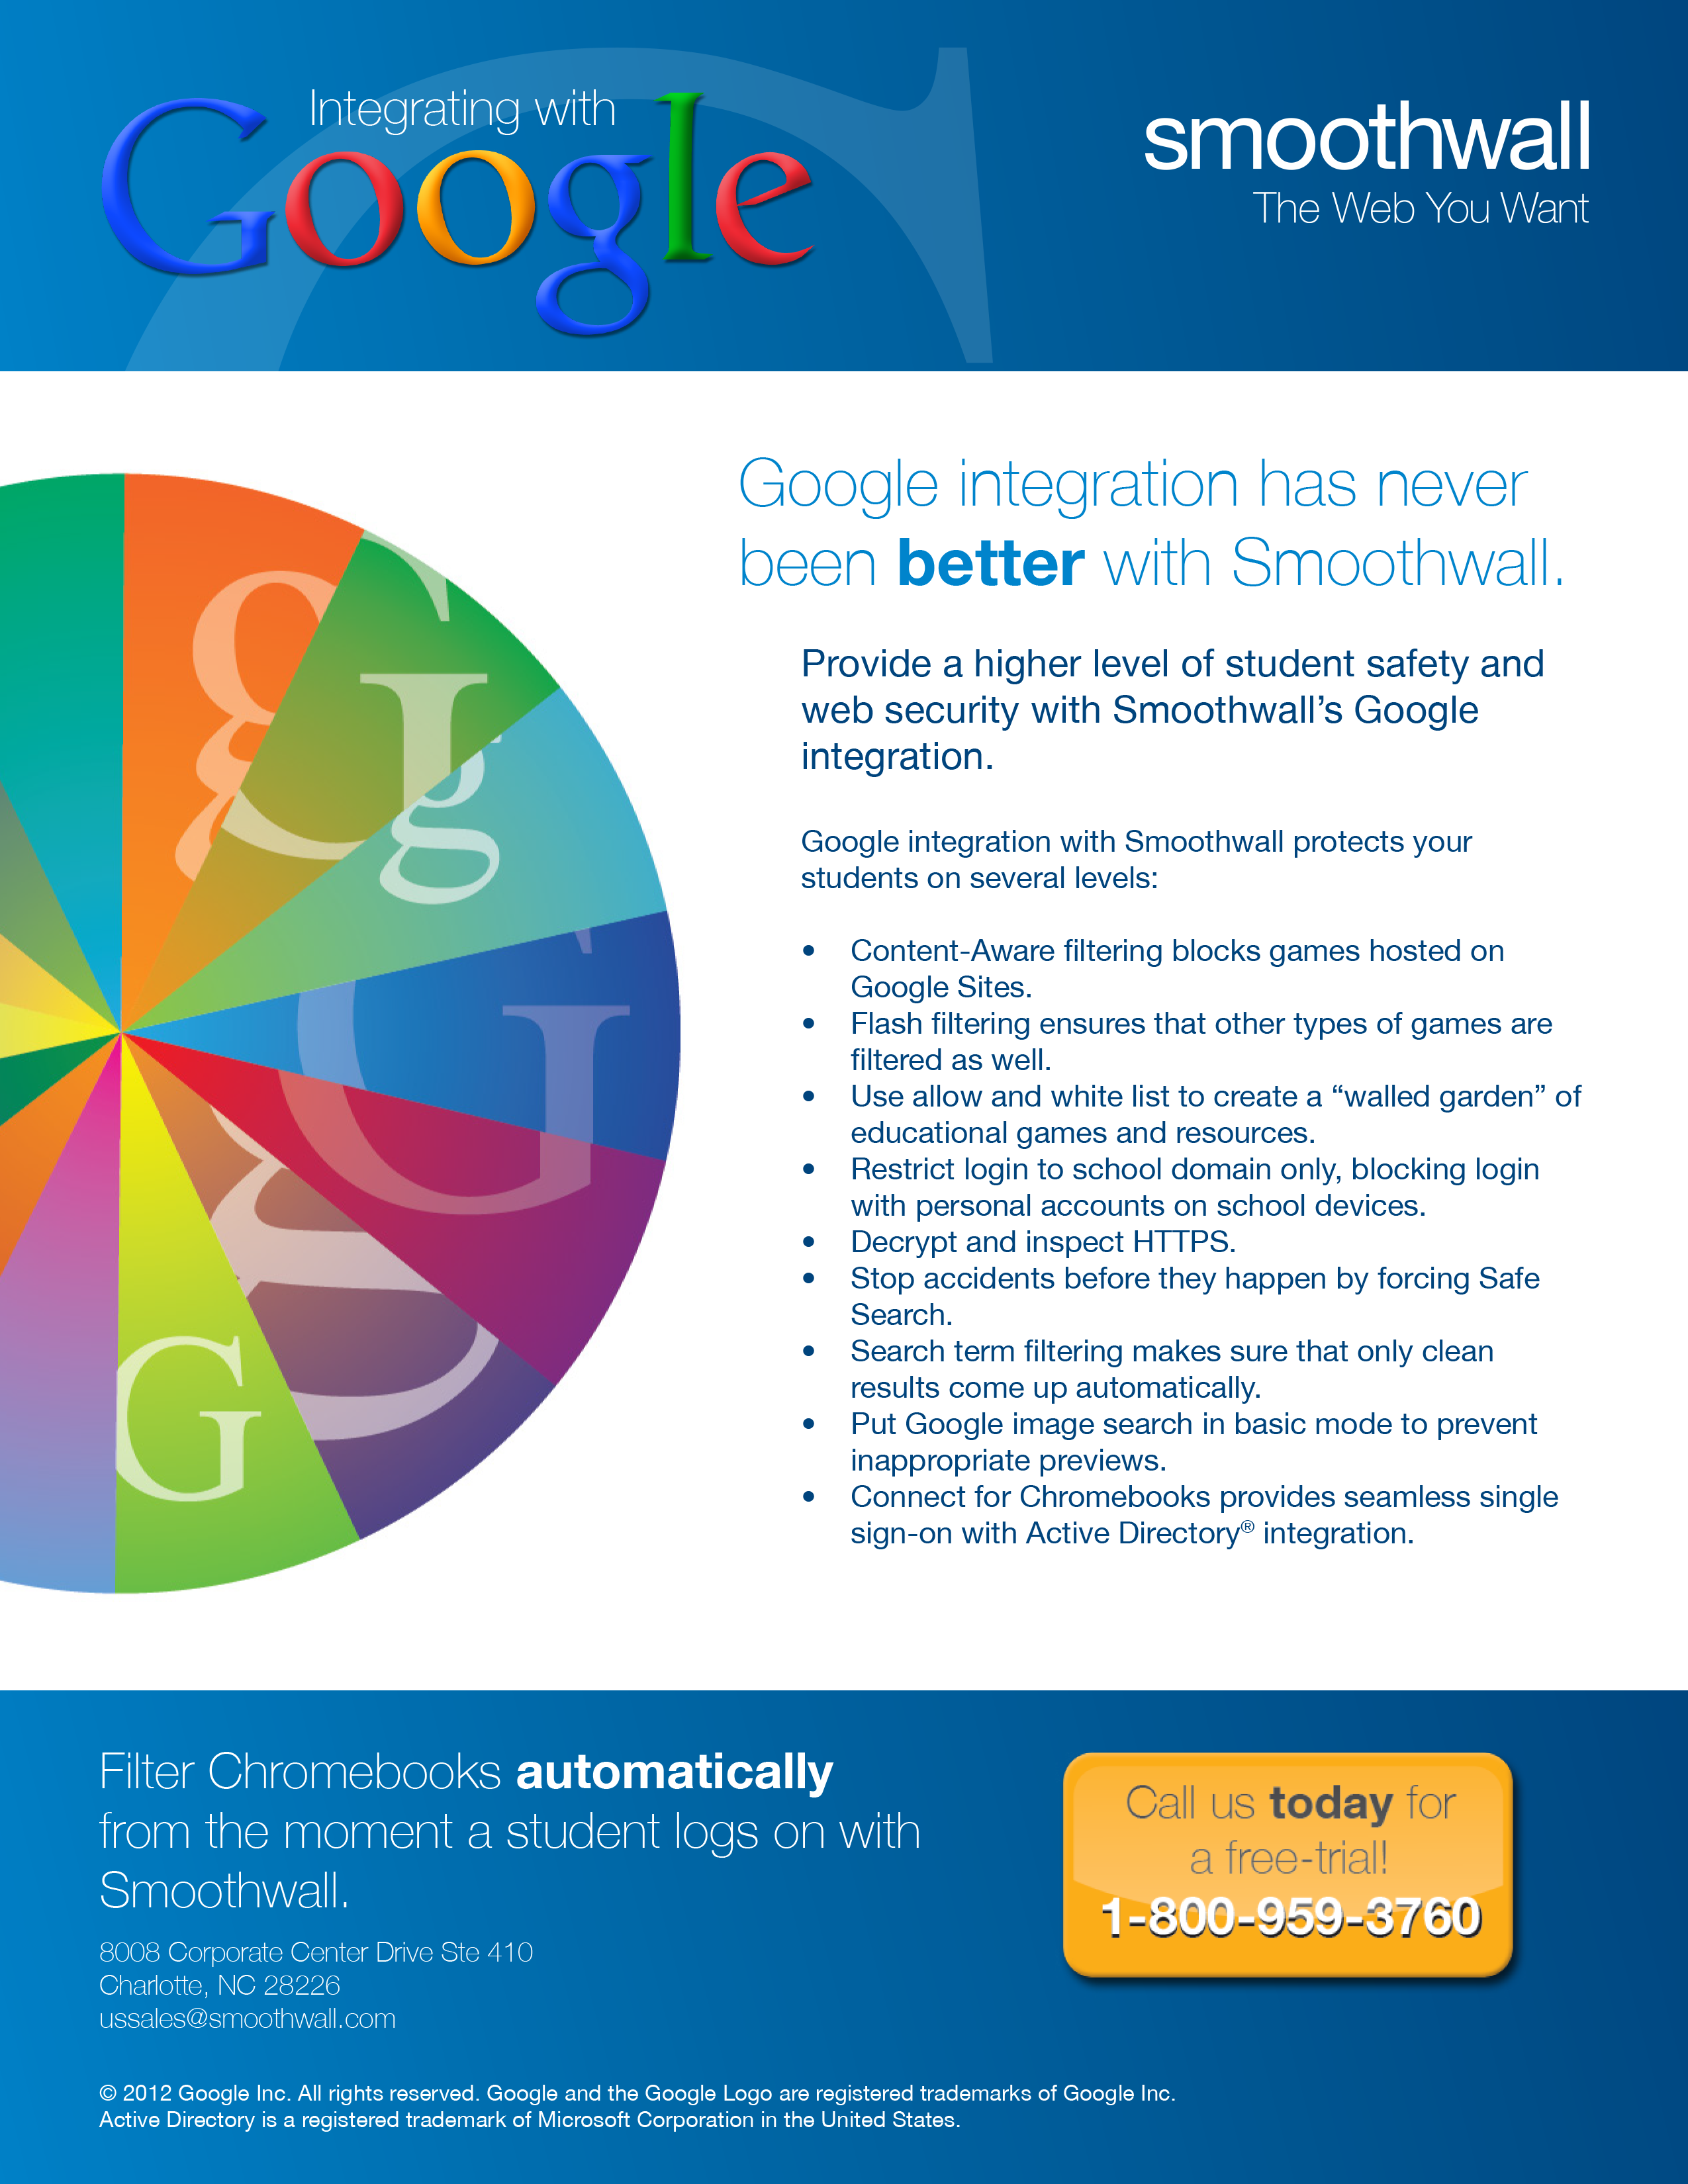 Smoothwall Google Integration